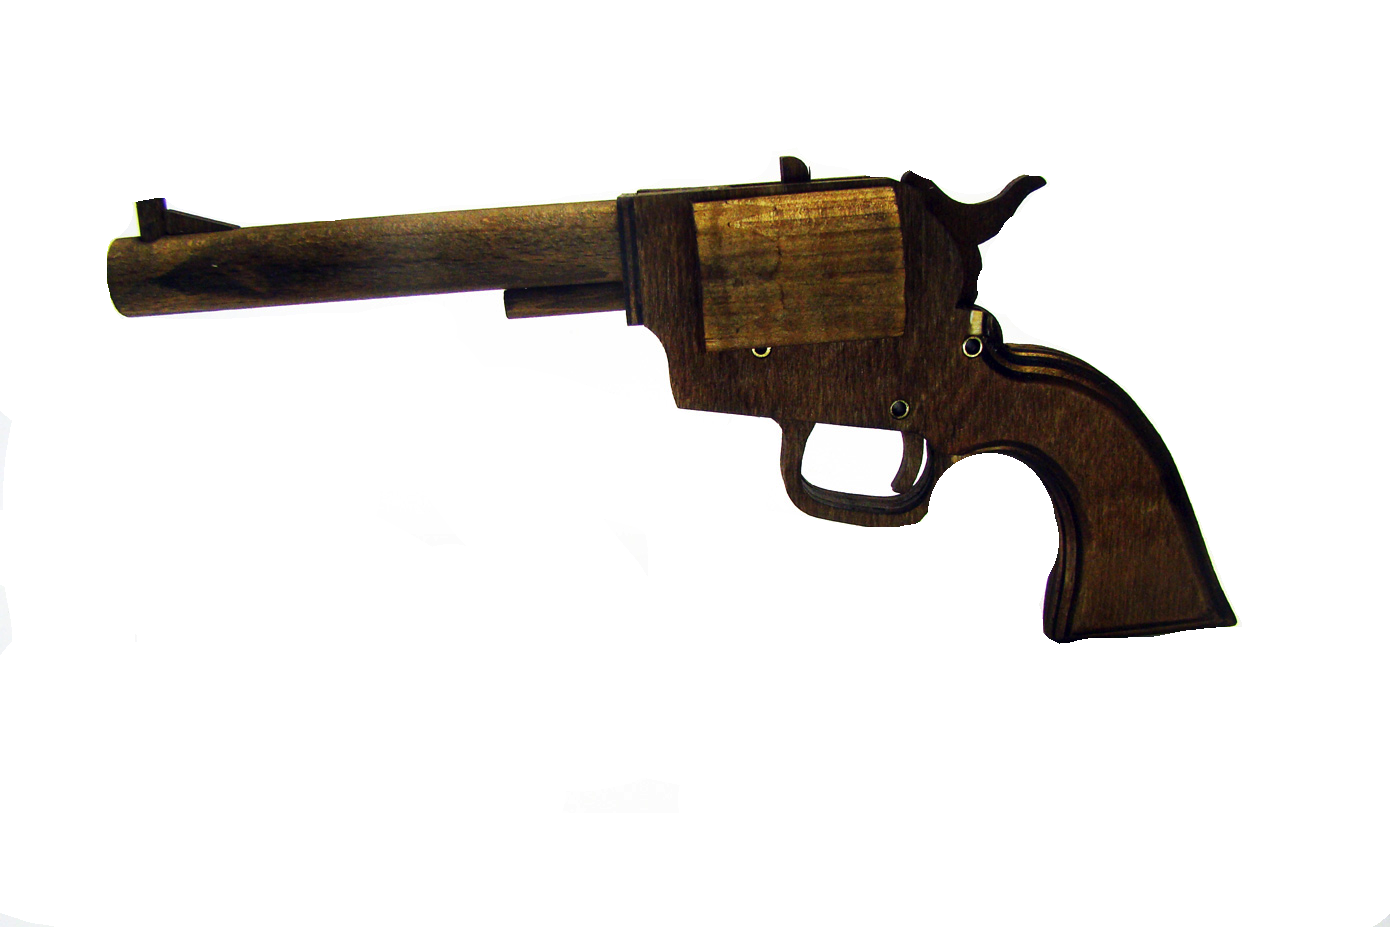 Деревянный макет пистолета Colt PeaceMaker